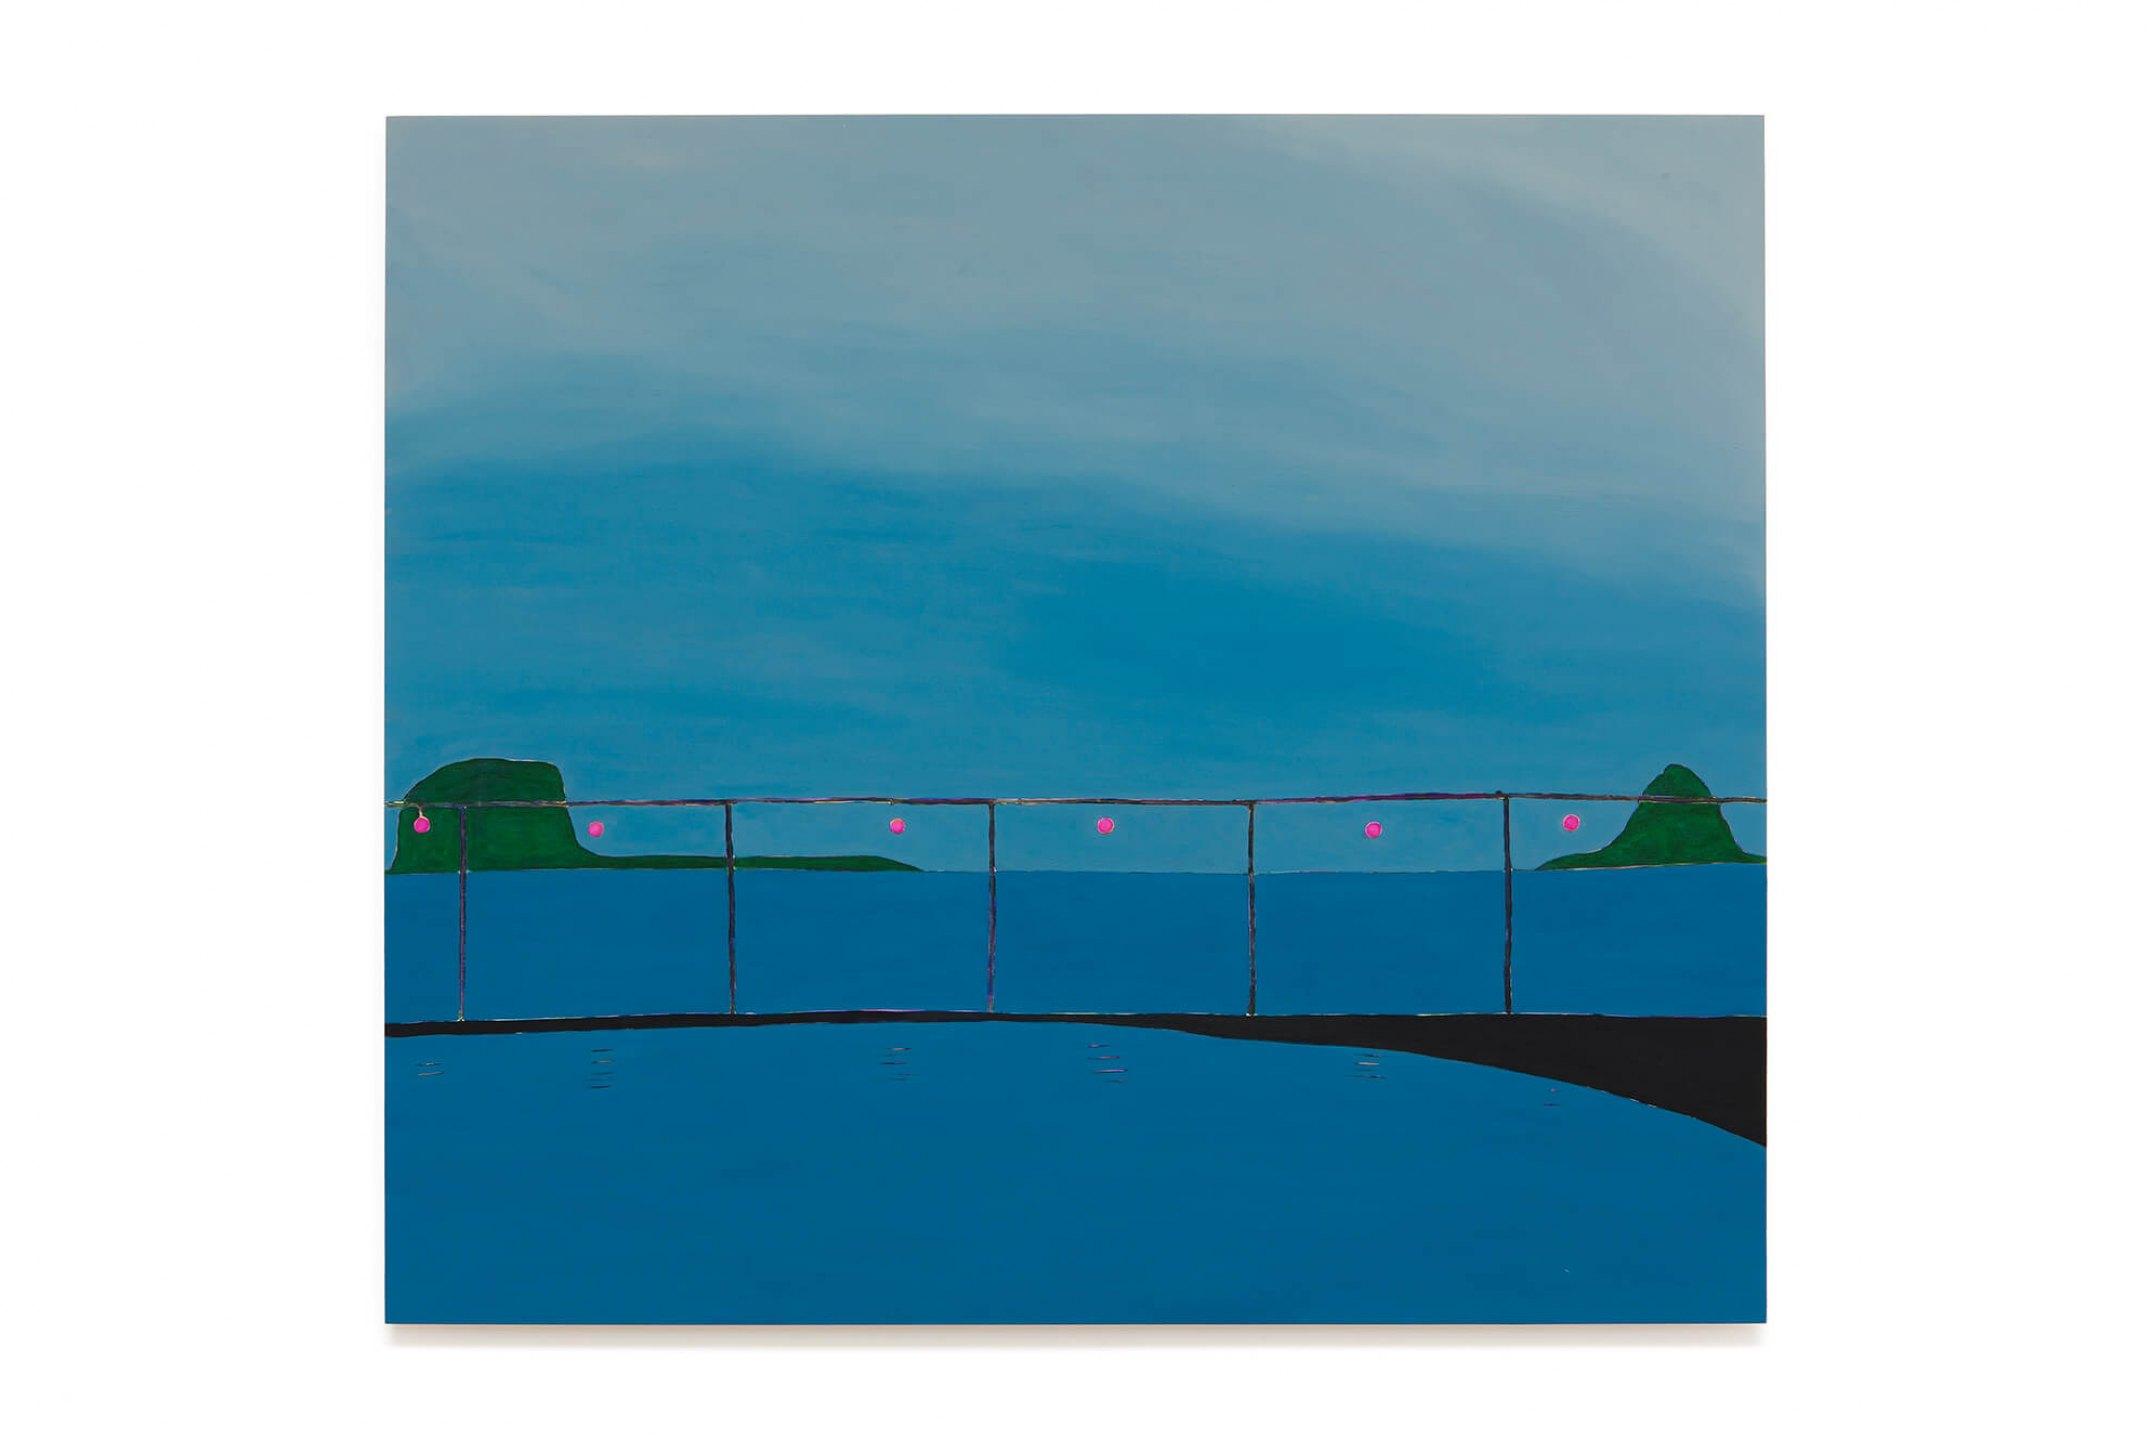 Patricia Leite, <em>Cais</em>, 2016, oil on wood, 130&nbsp;×&nbsp;150 cm&nbsp; - Mendes Wood DM